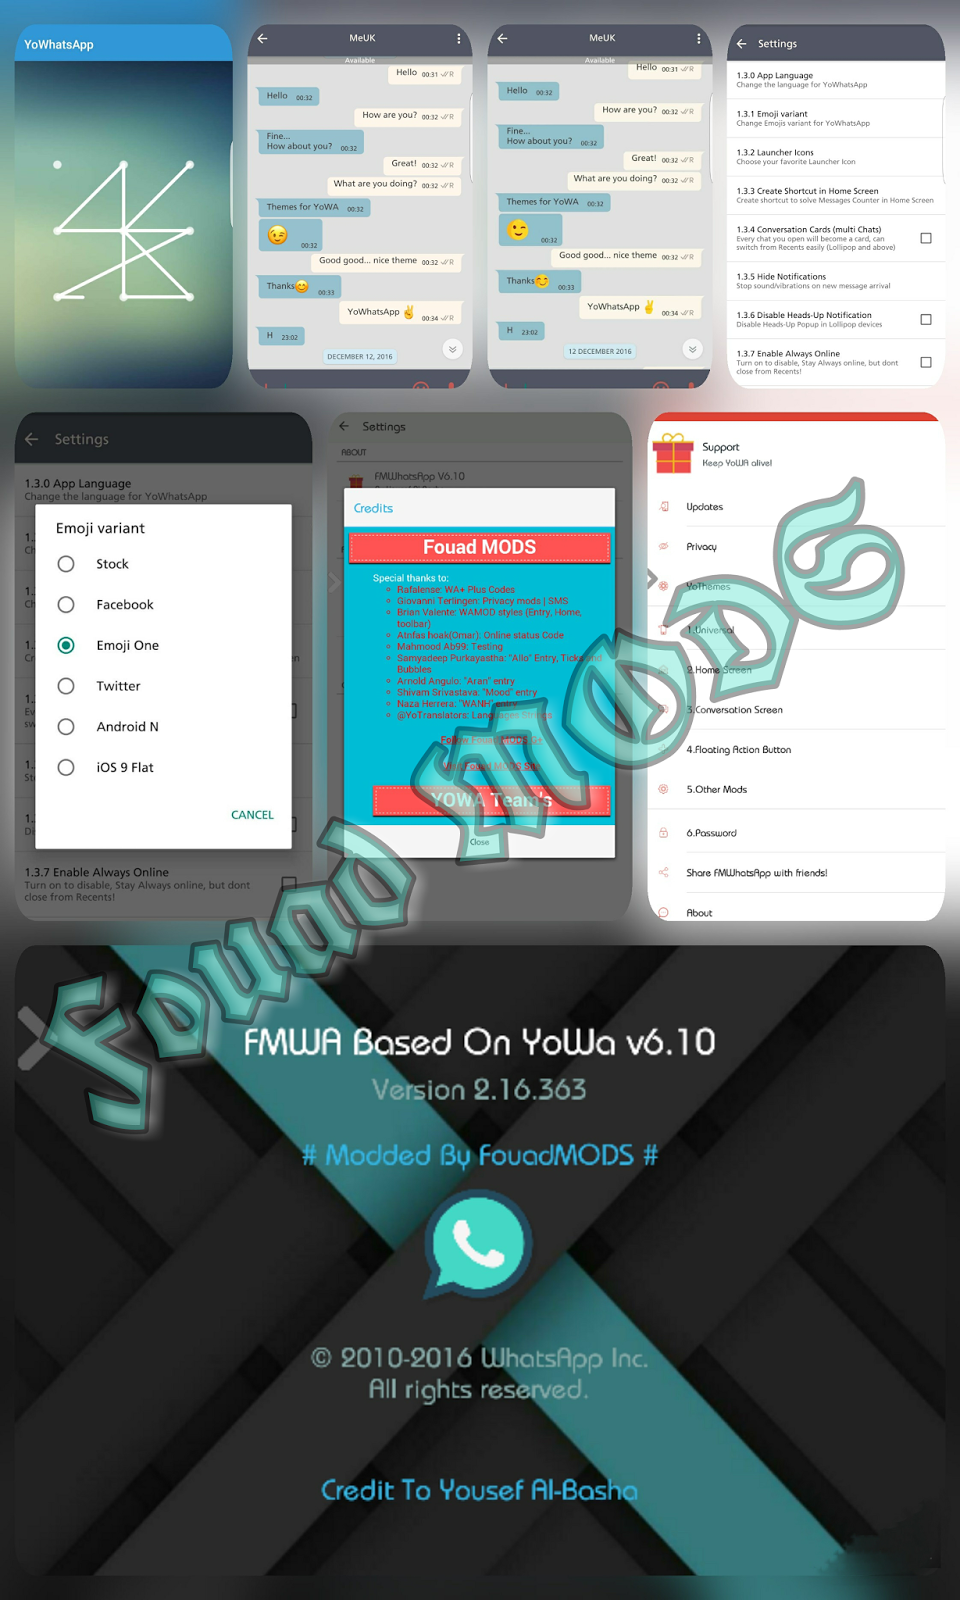 Download Fmwhatsapp V6 67 : download, fmwhatsapp, Fouad, WhatsApp+, FMWhatsApp, V6.10, Latest, Version, Download